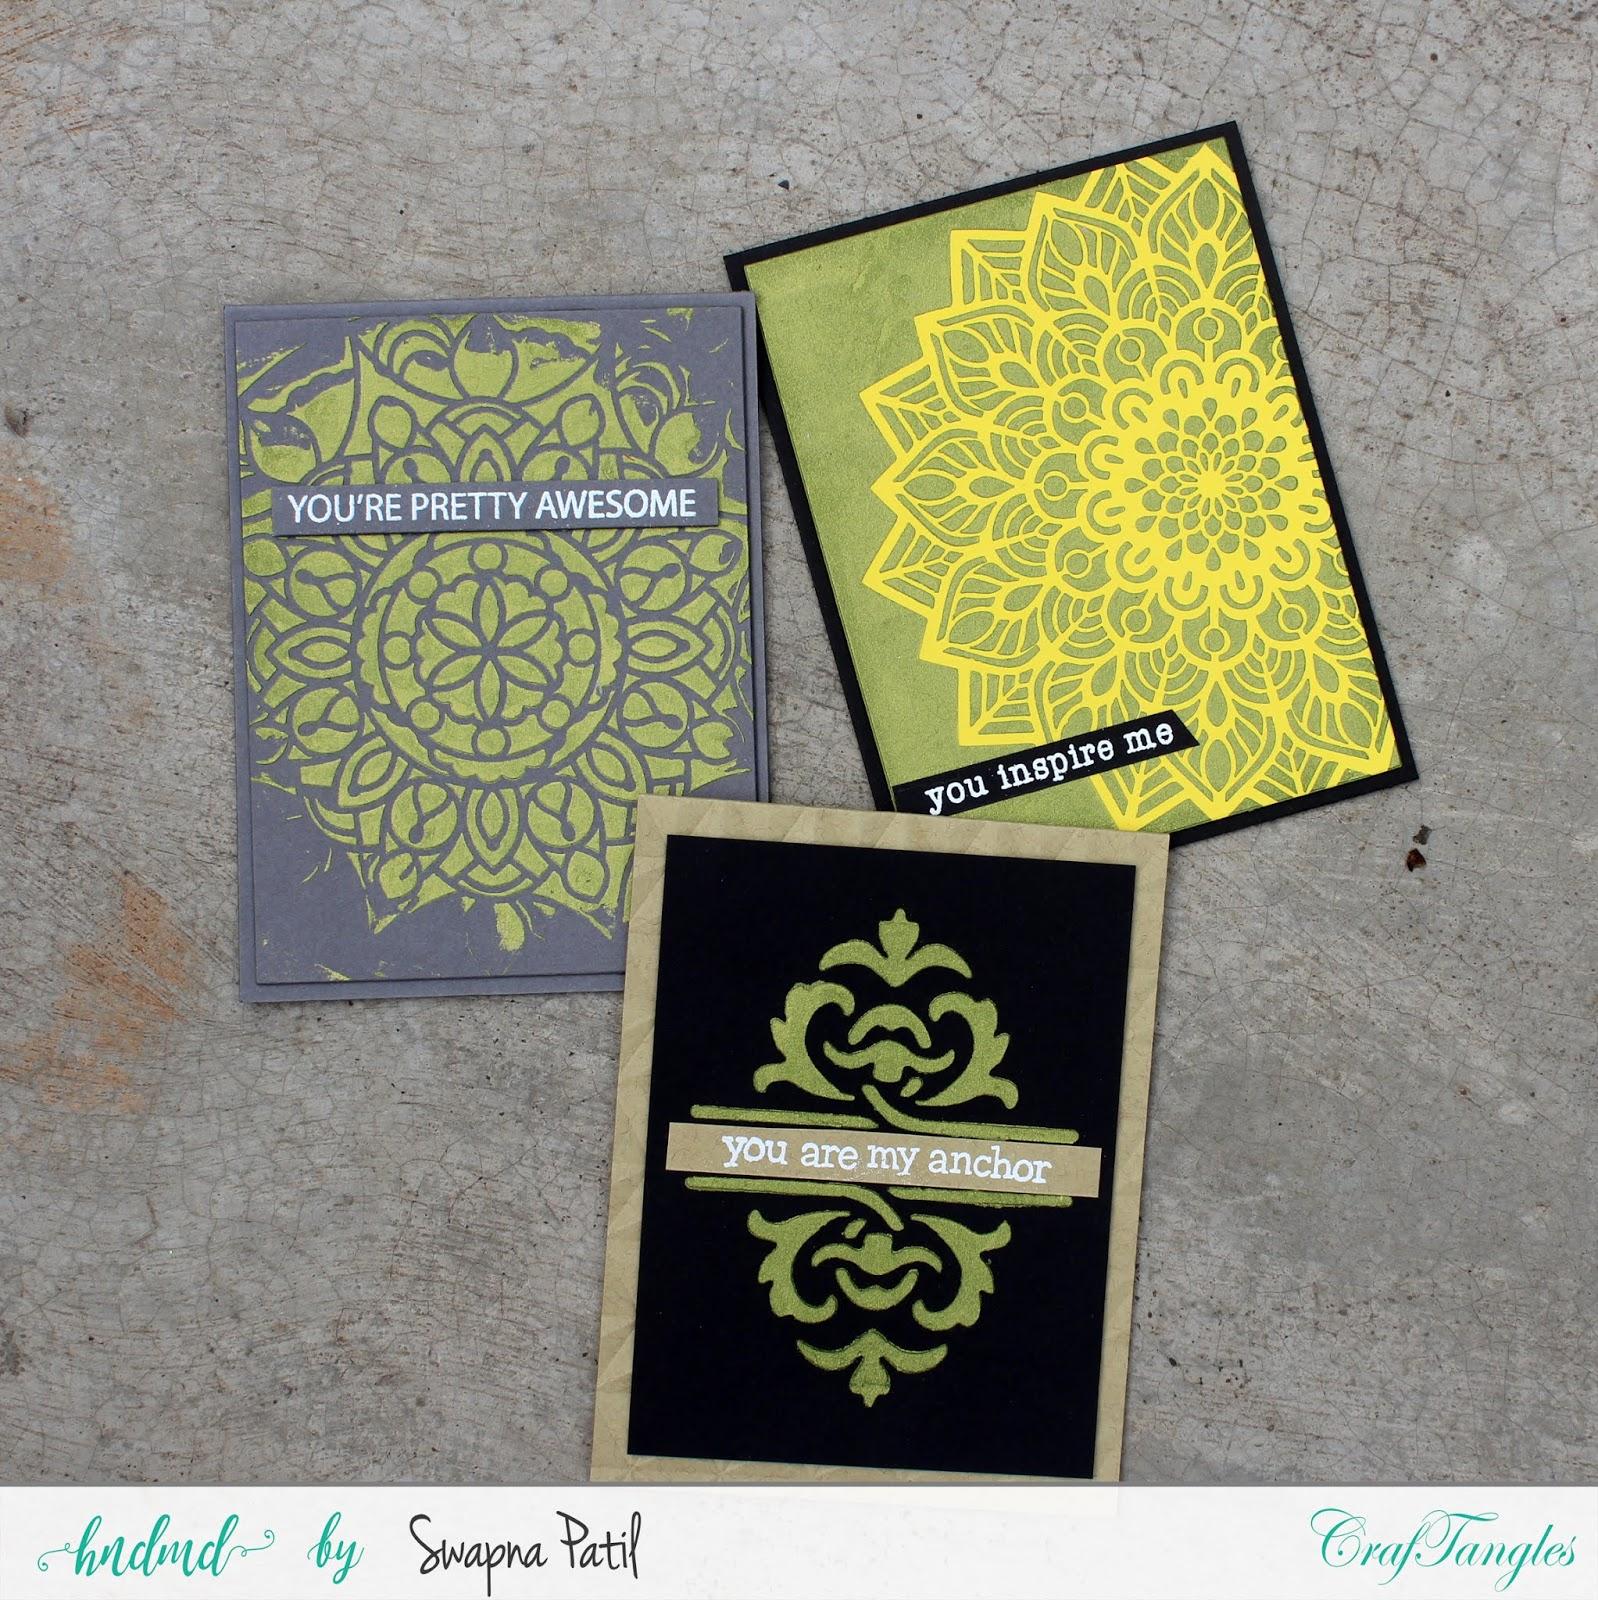 Cards for teachers Part 2 - Swapna Patil 3